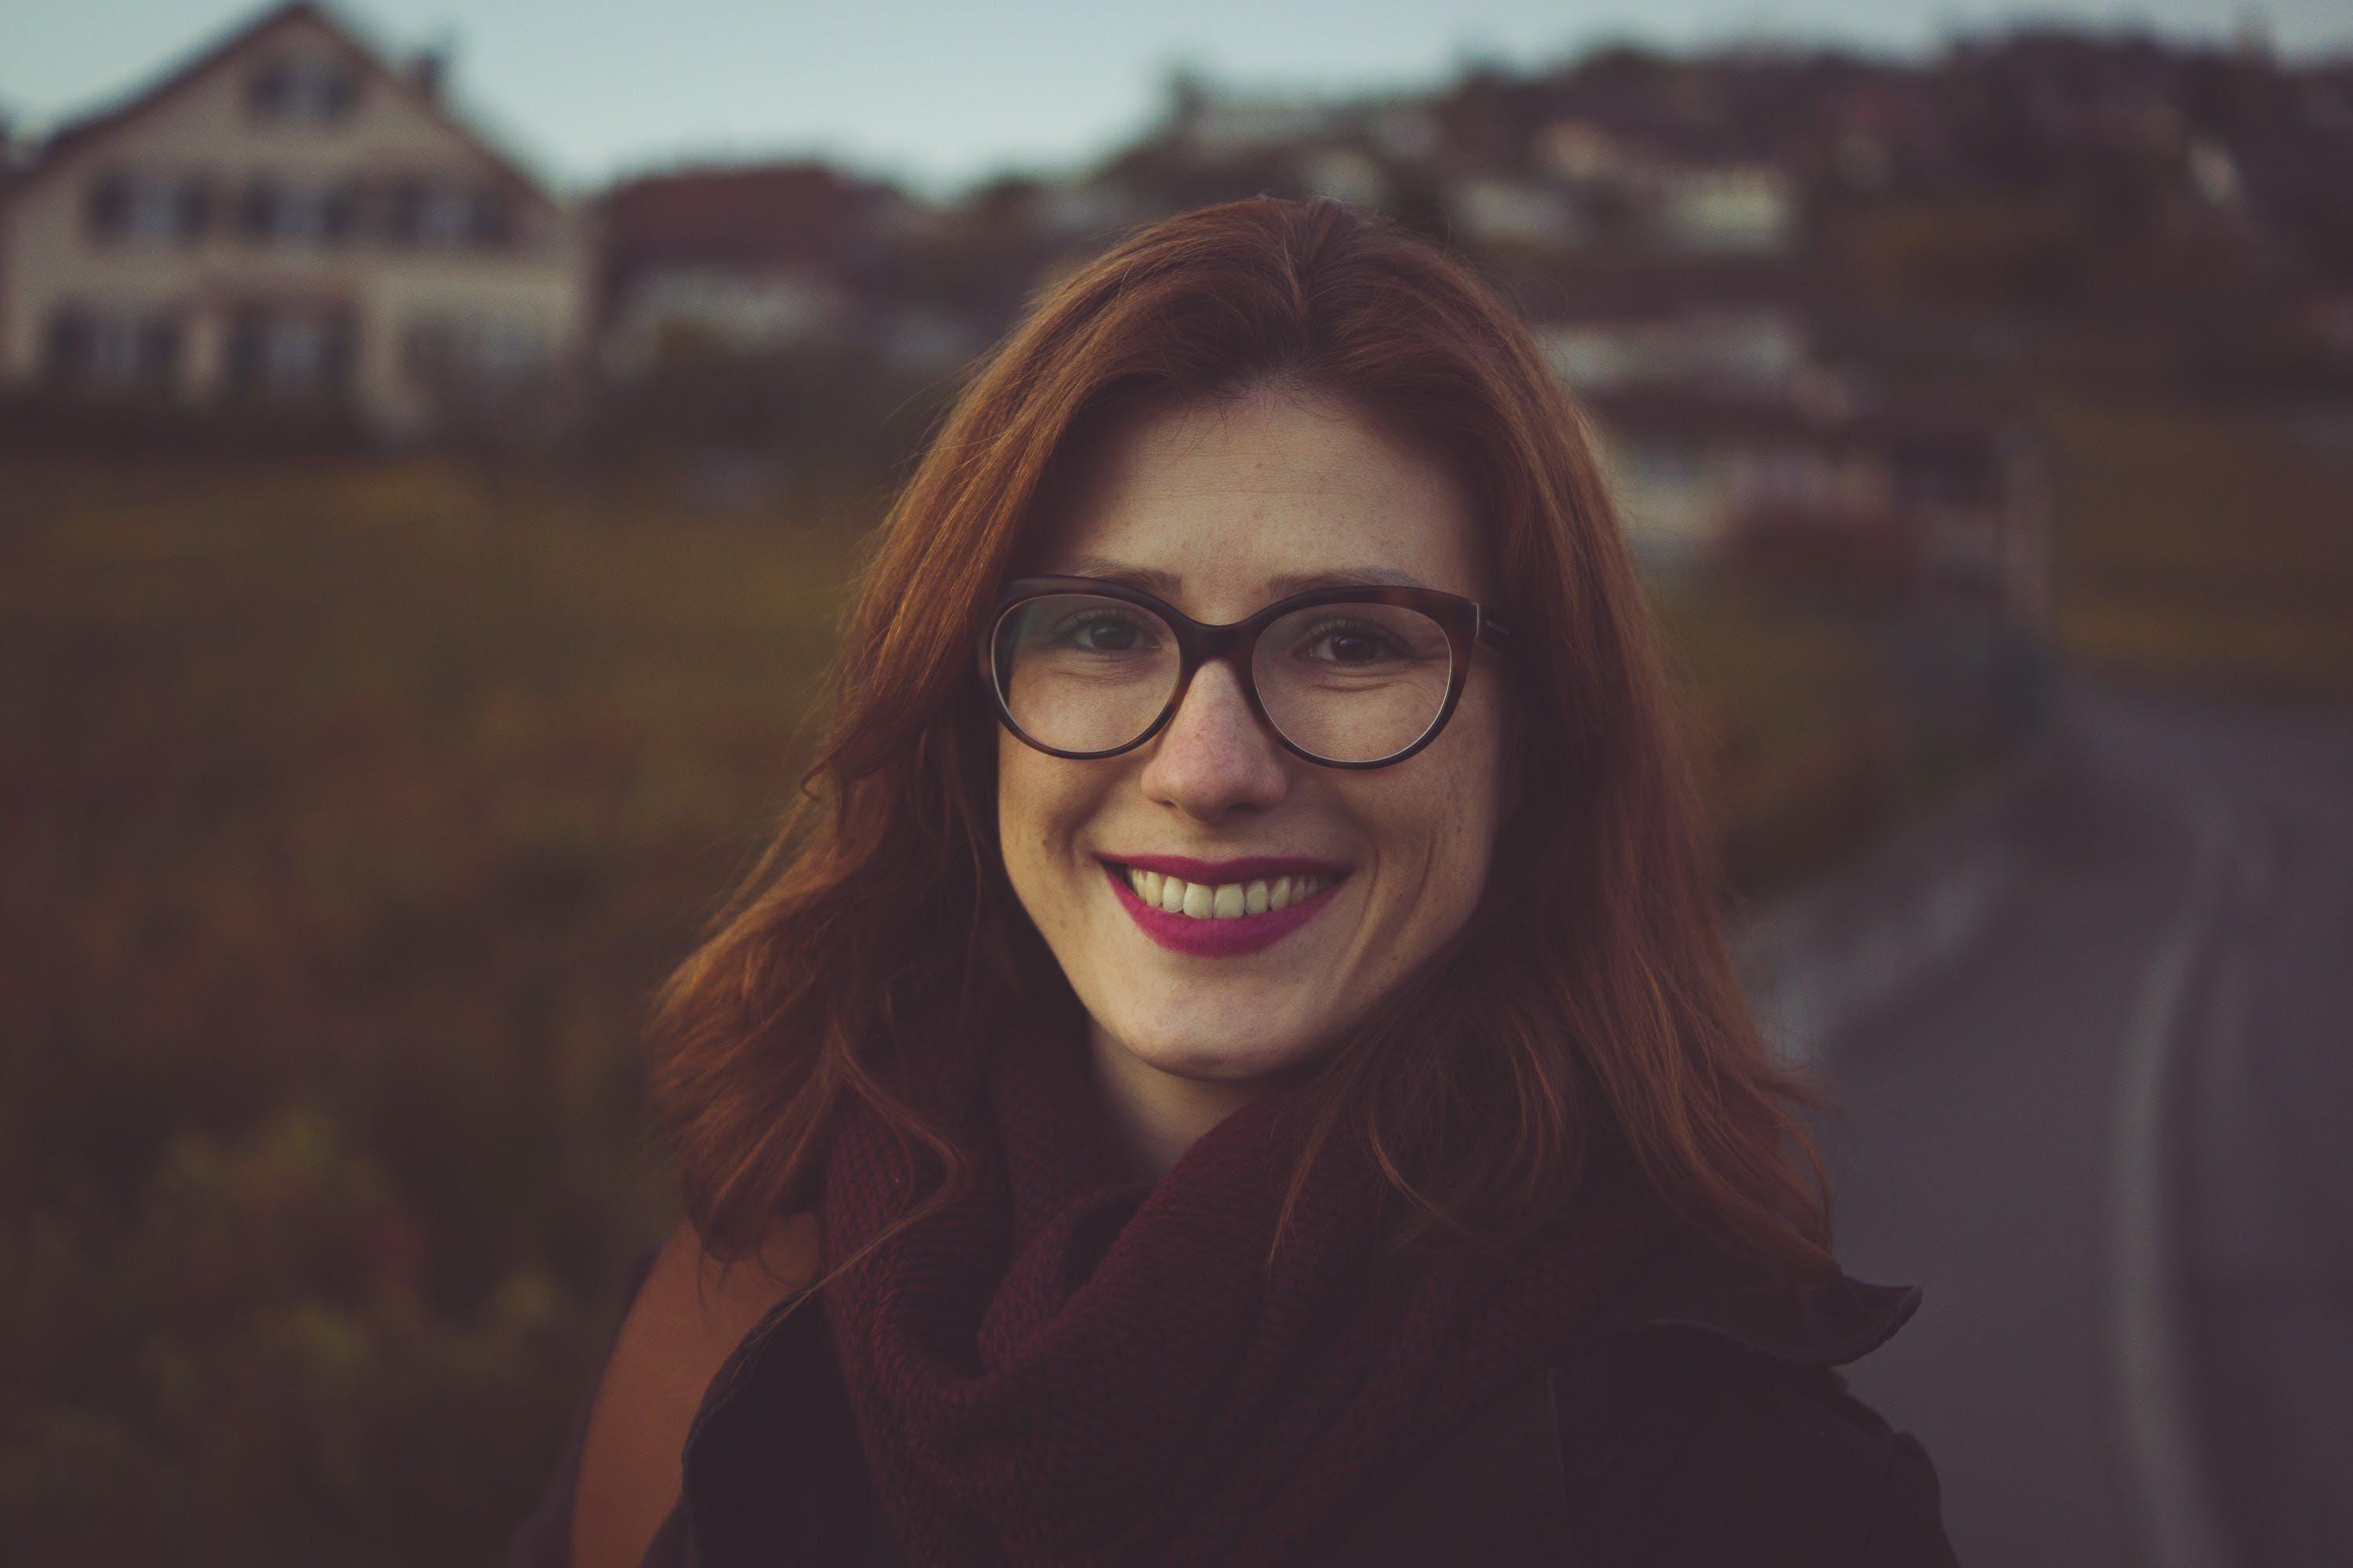 Closeup Photo of Woman Wearing Eyeglasses